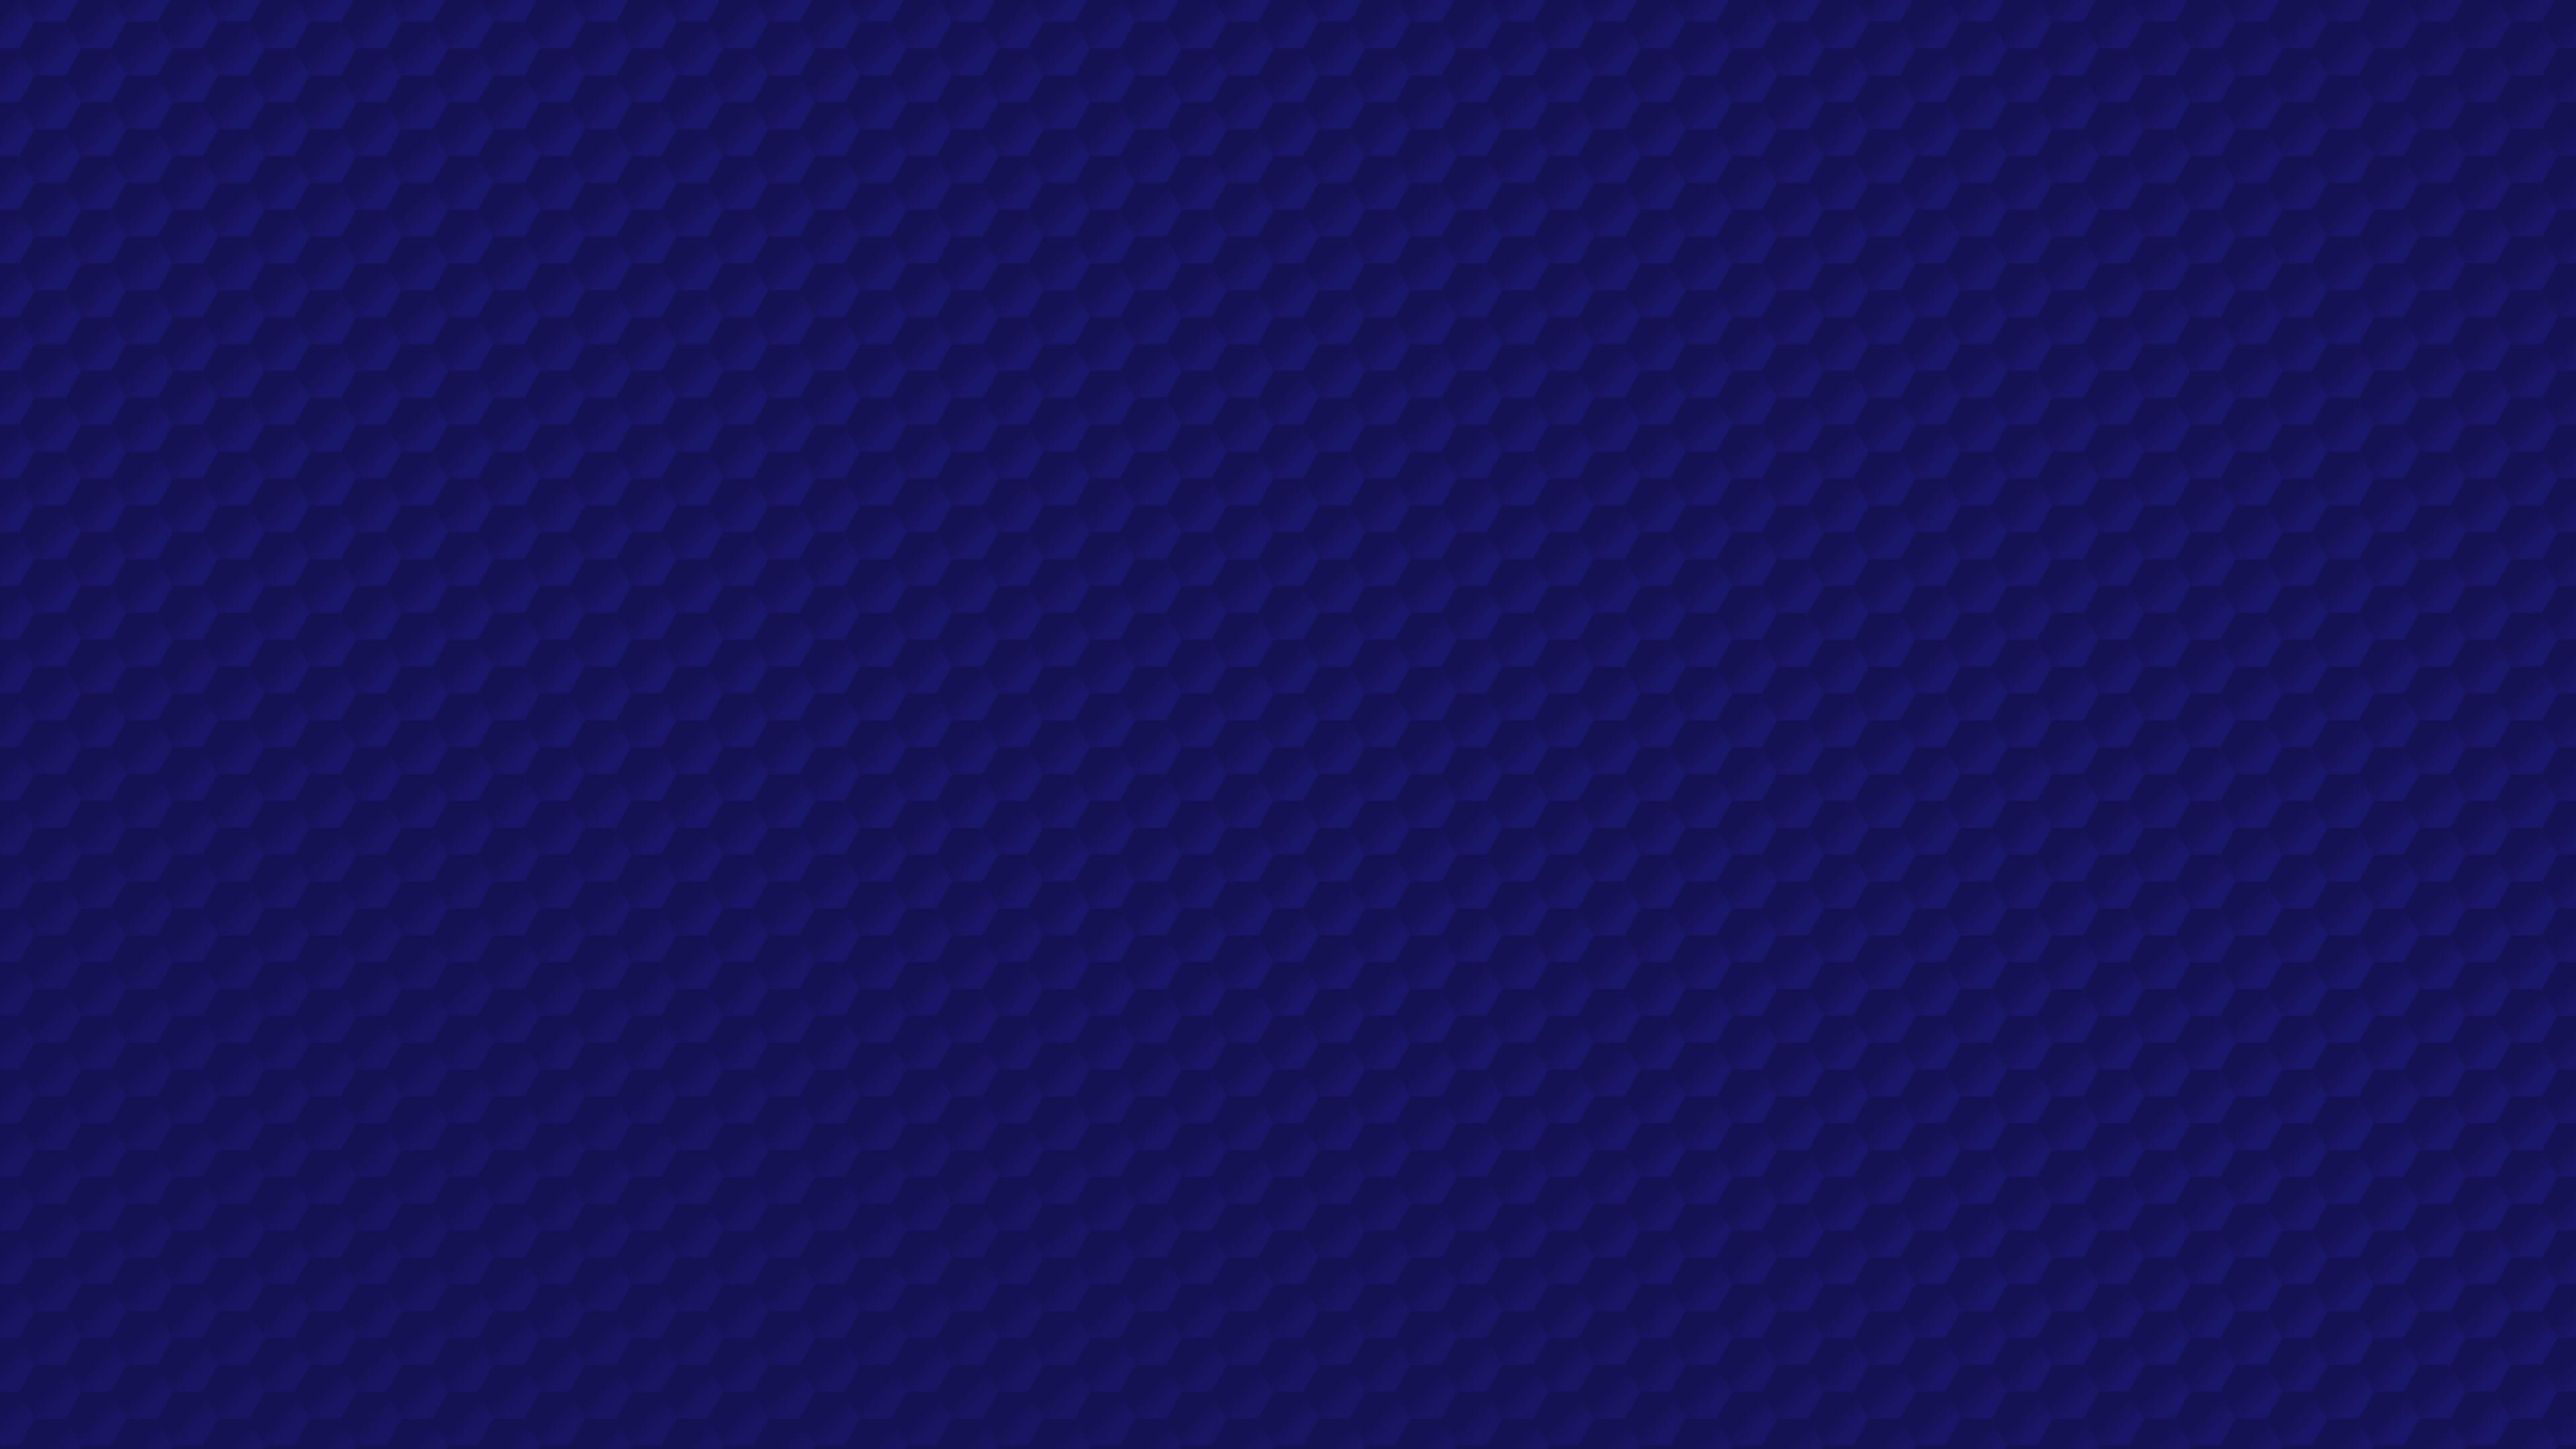 Dark Blue Honeycomb Pattern 4K Wallpapers 3840x2160